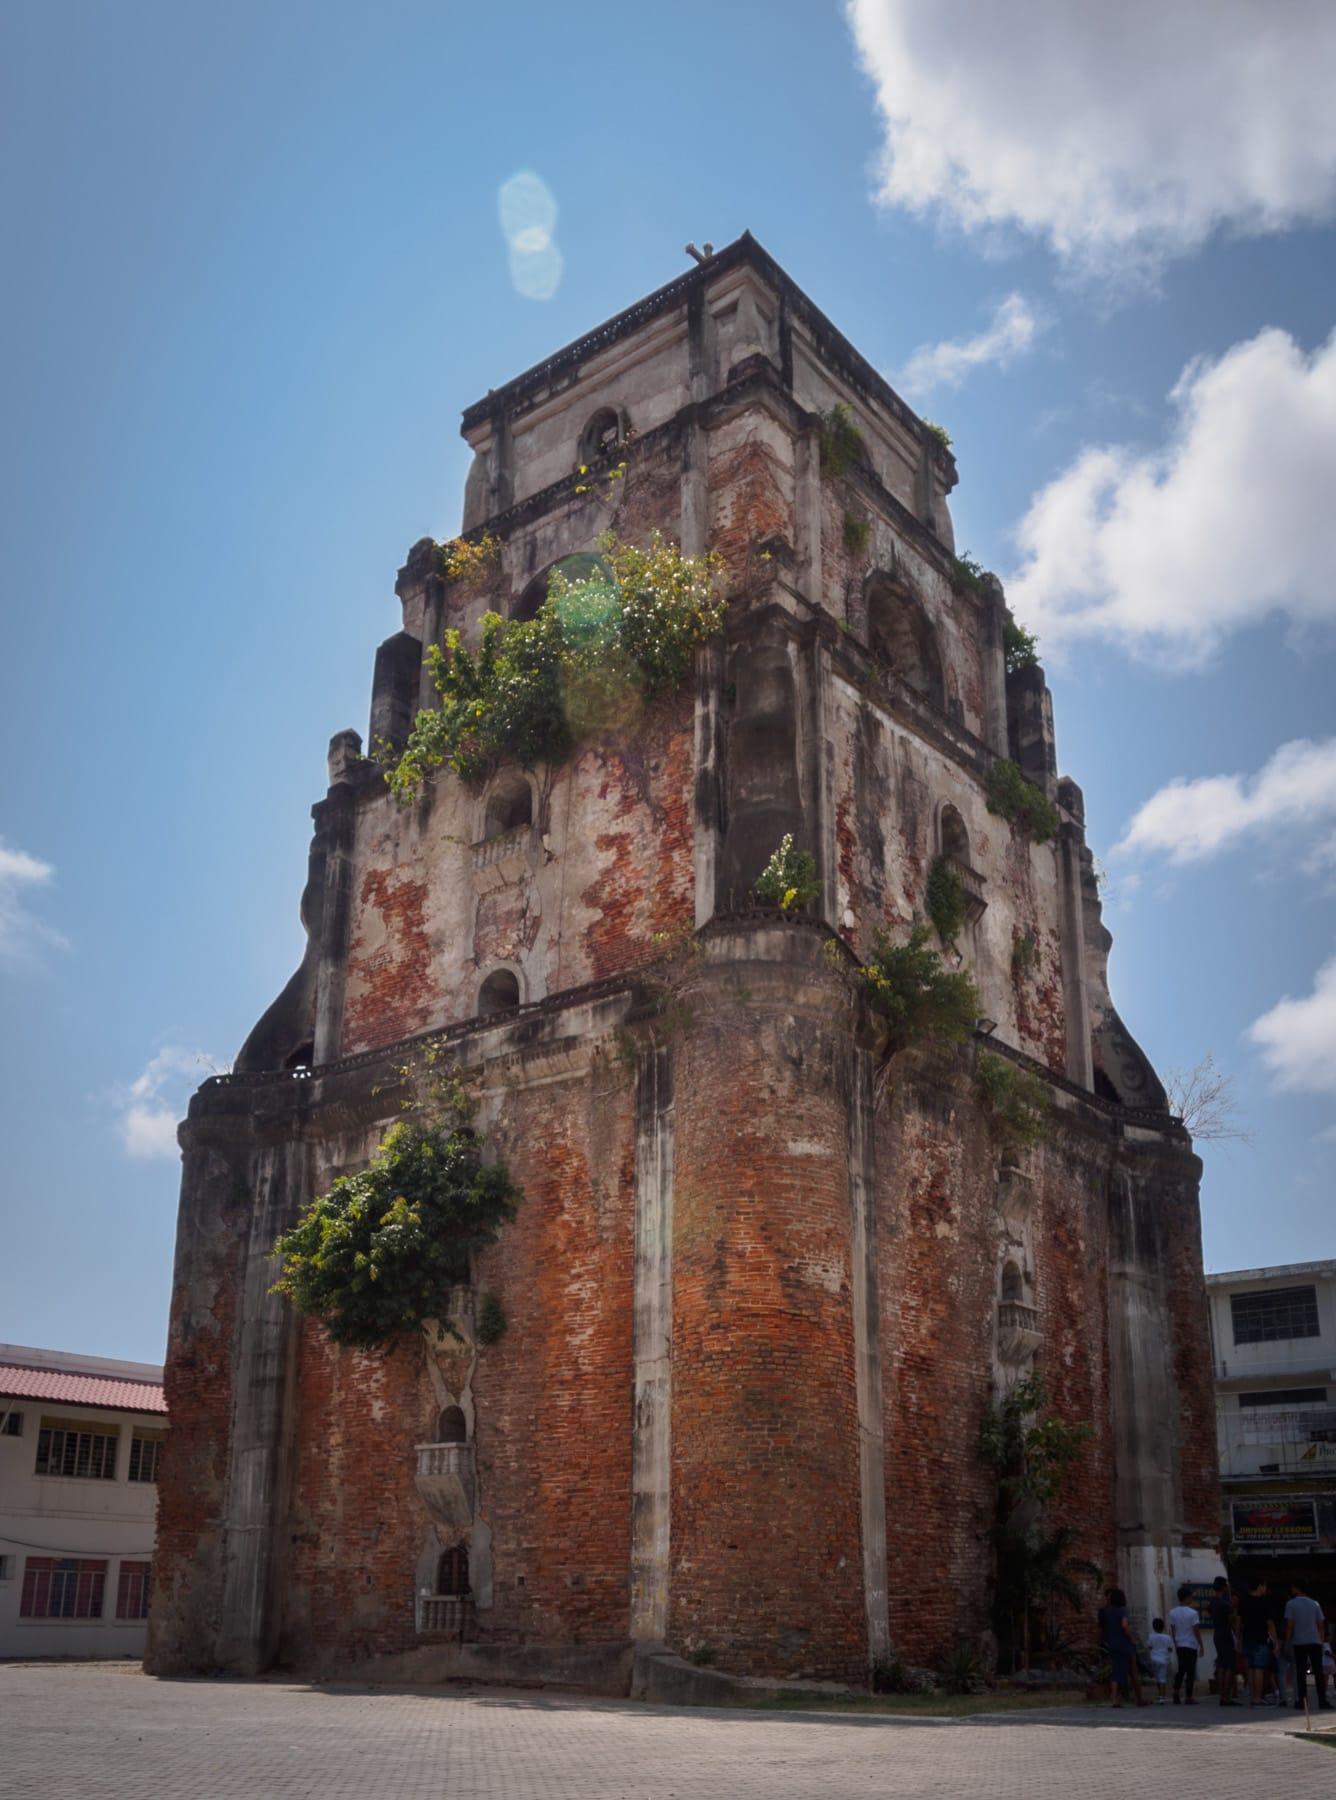 Ilocos Norte Tourist spots, Sinking Bell Tower, things to do in Laoag, tourist spots in Ilocos Norte